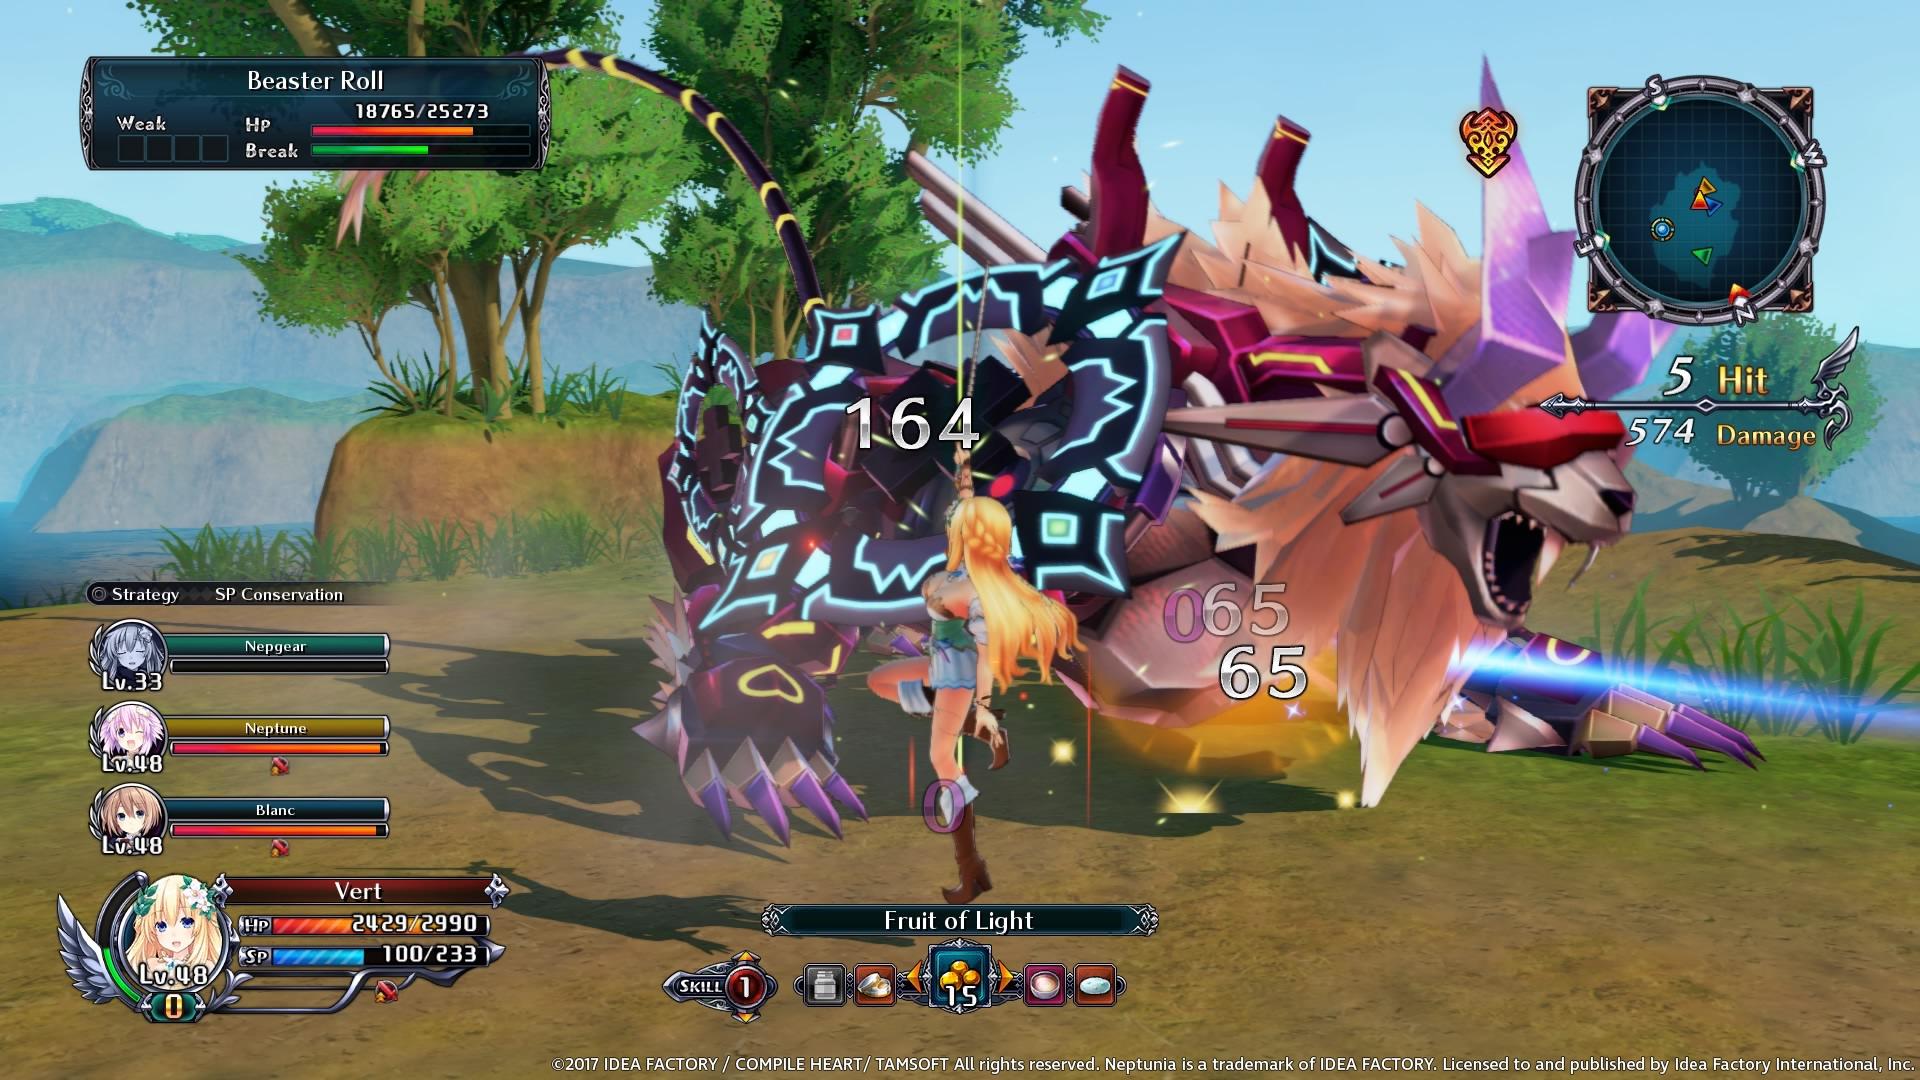 Cyberdimension Neptunia 4 Goddesses Online